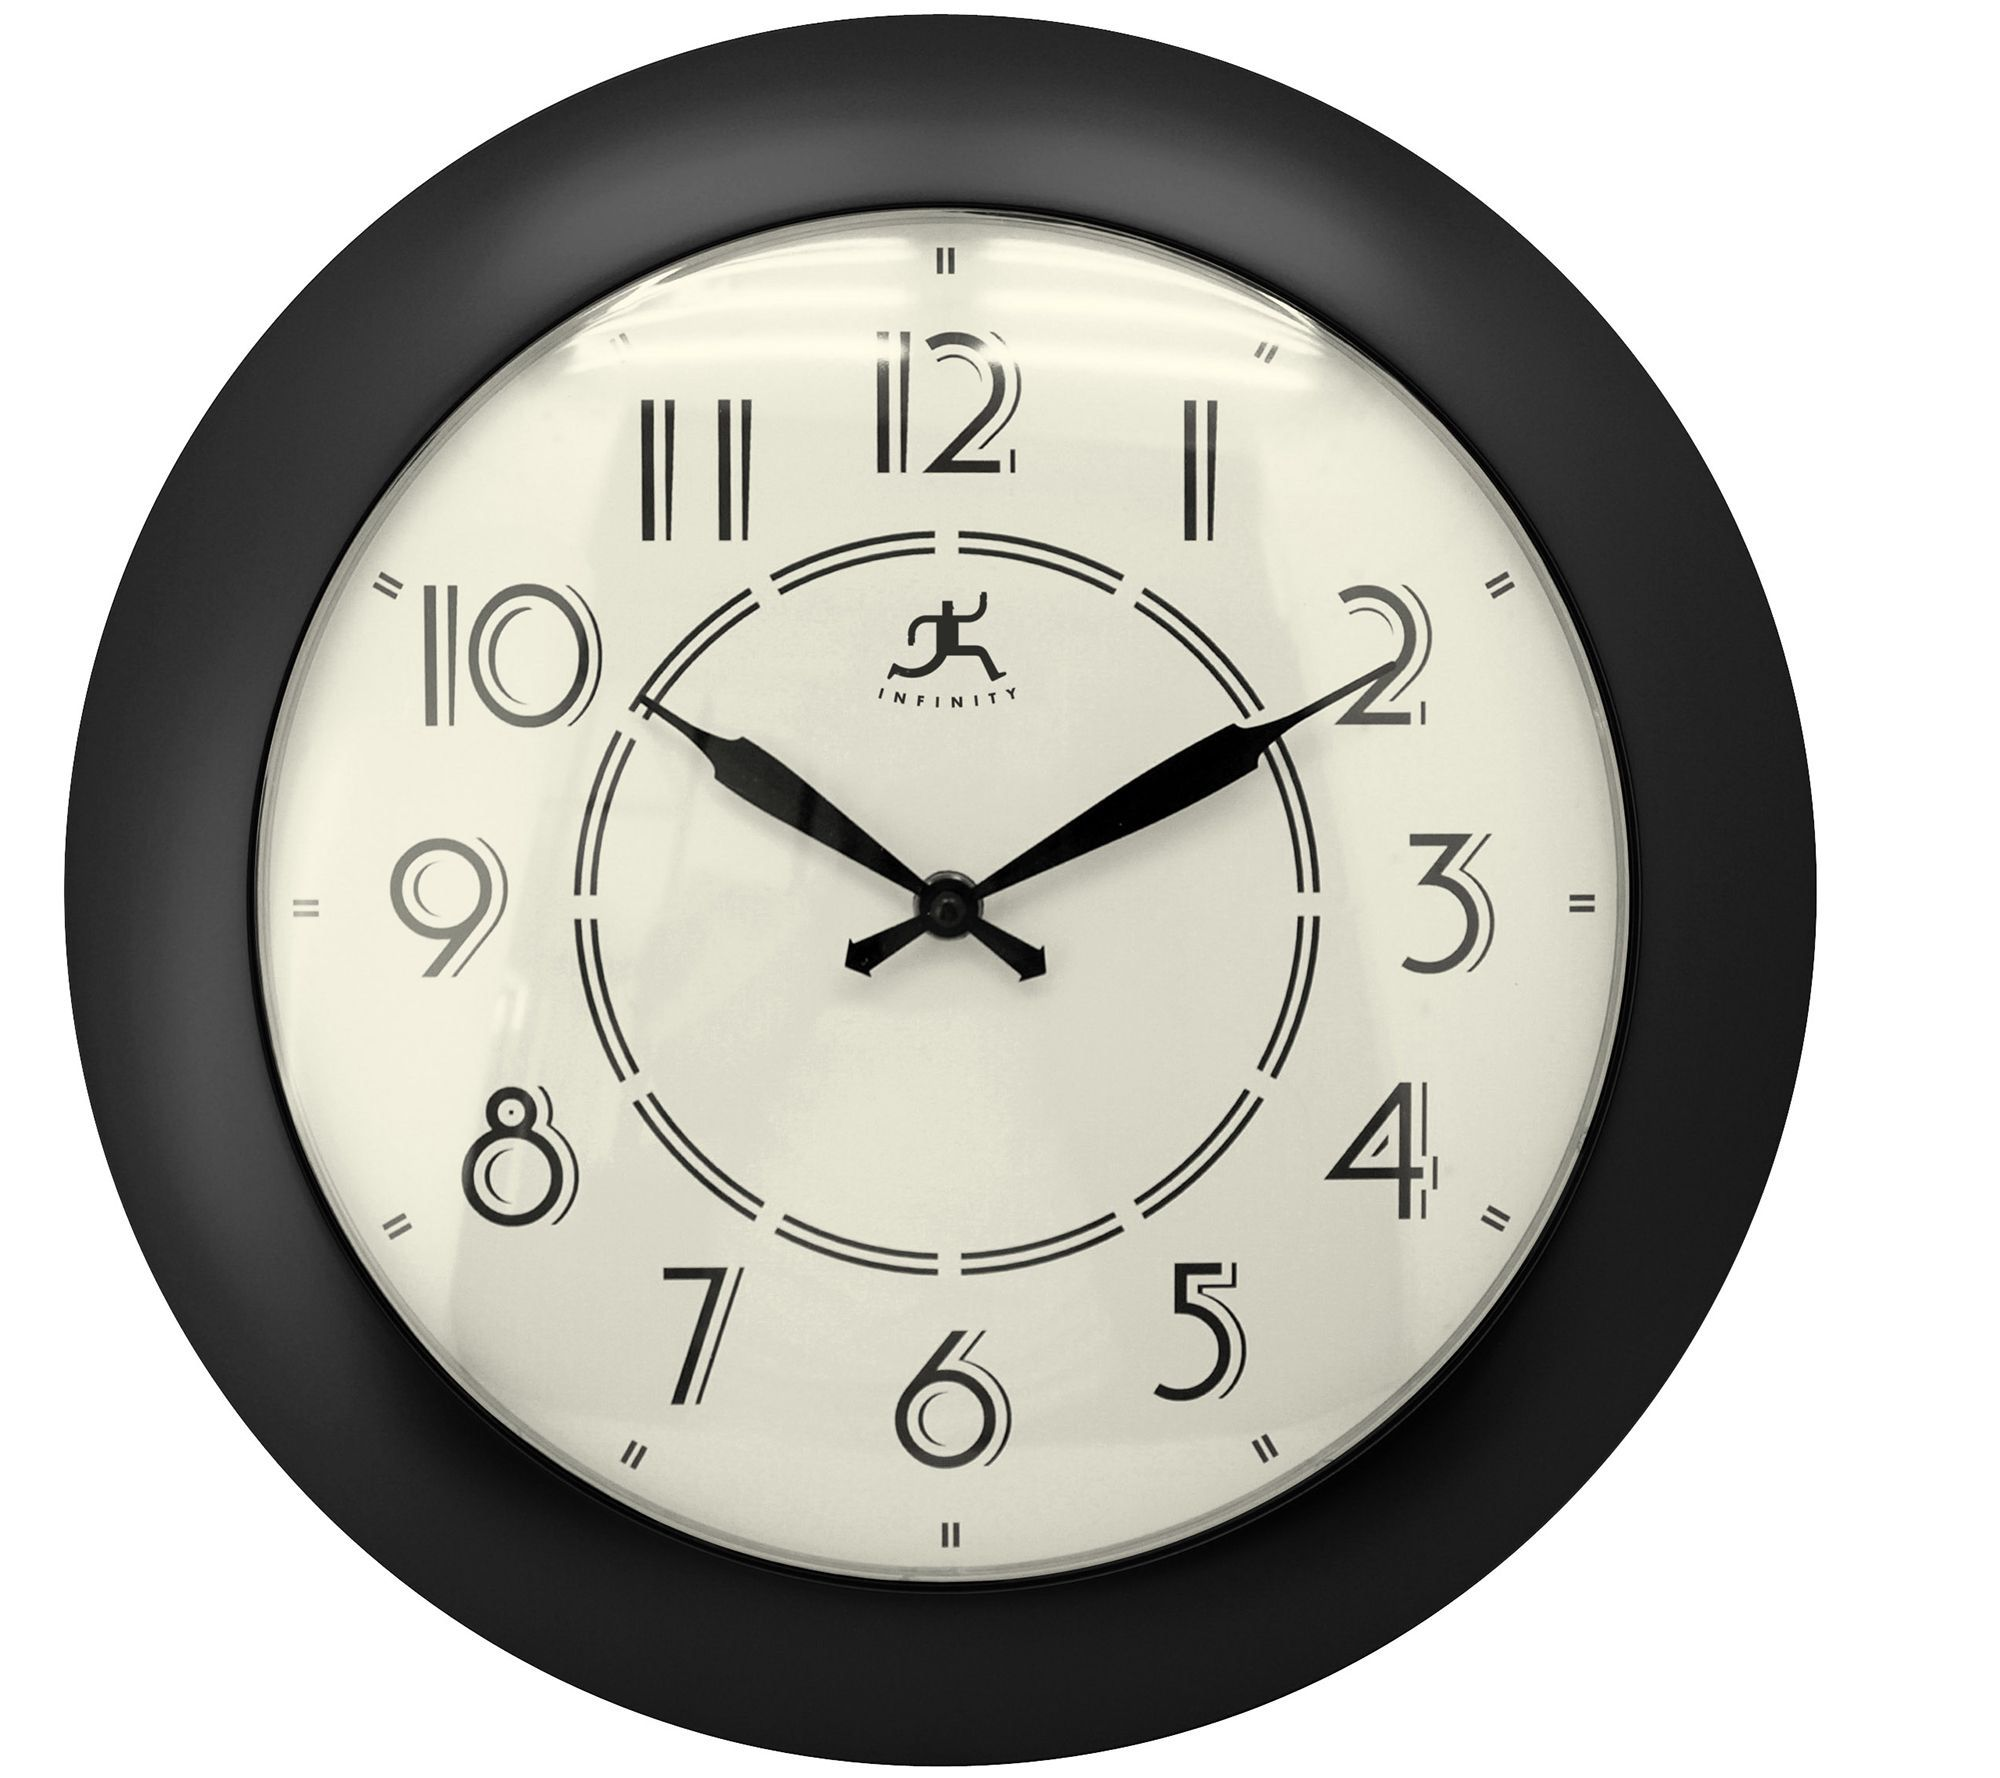 "Jitter Bug 14-1/2"" Wall Clock by Infinity"